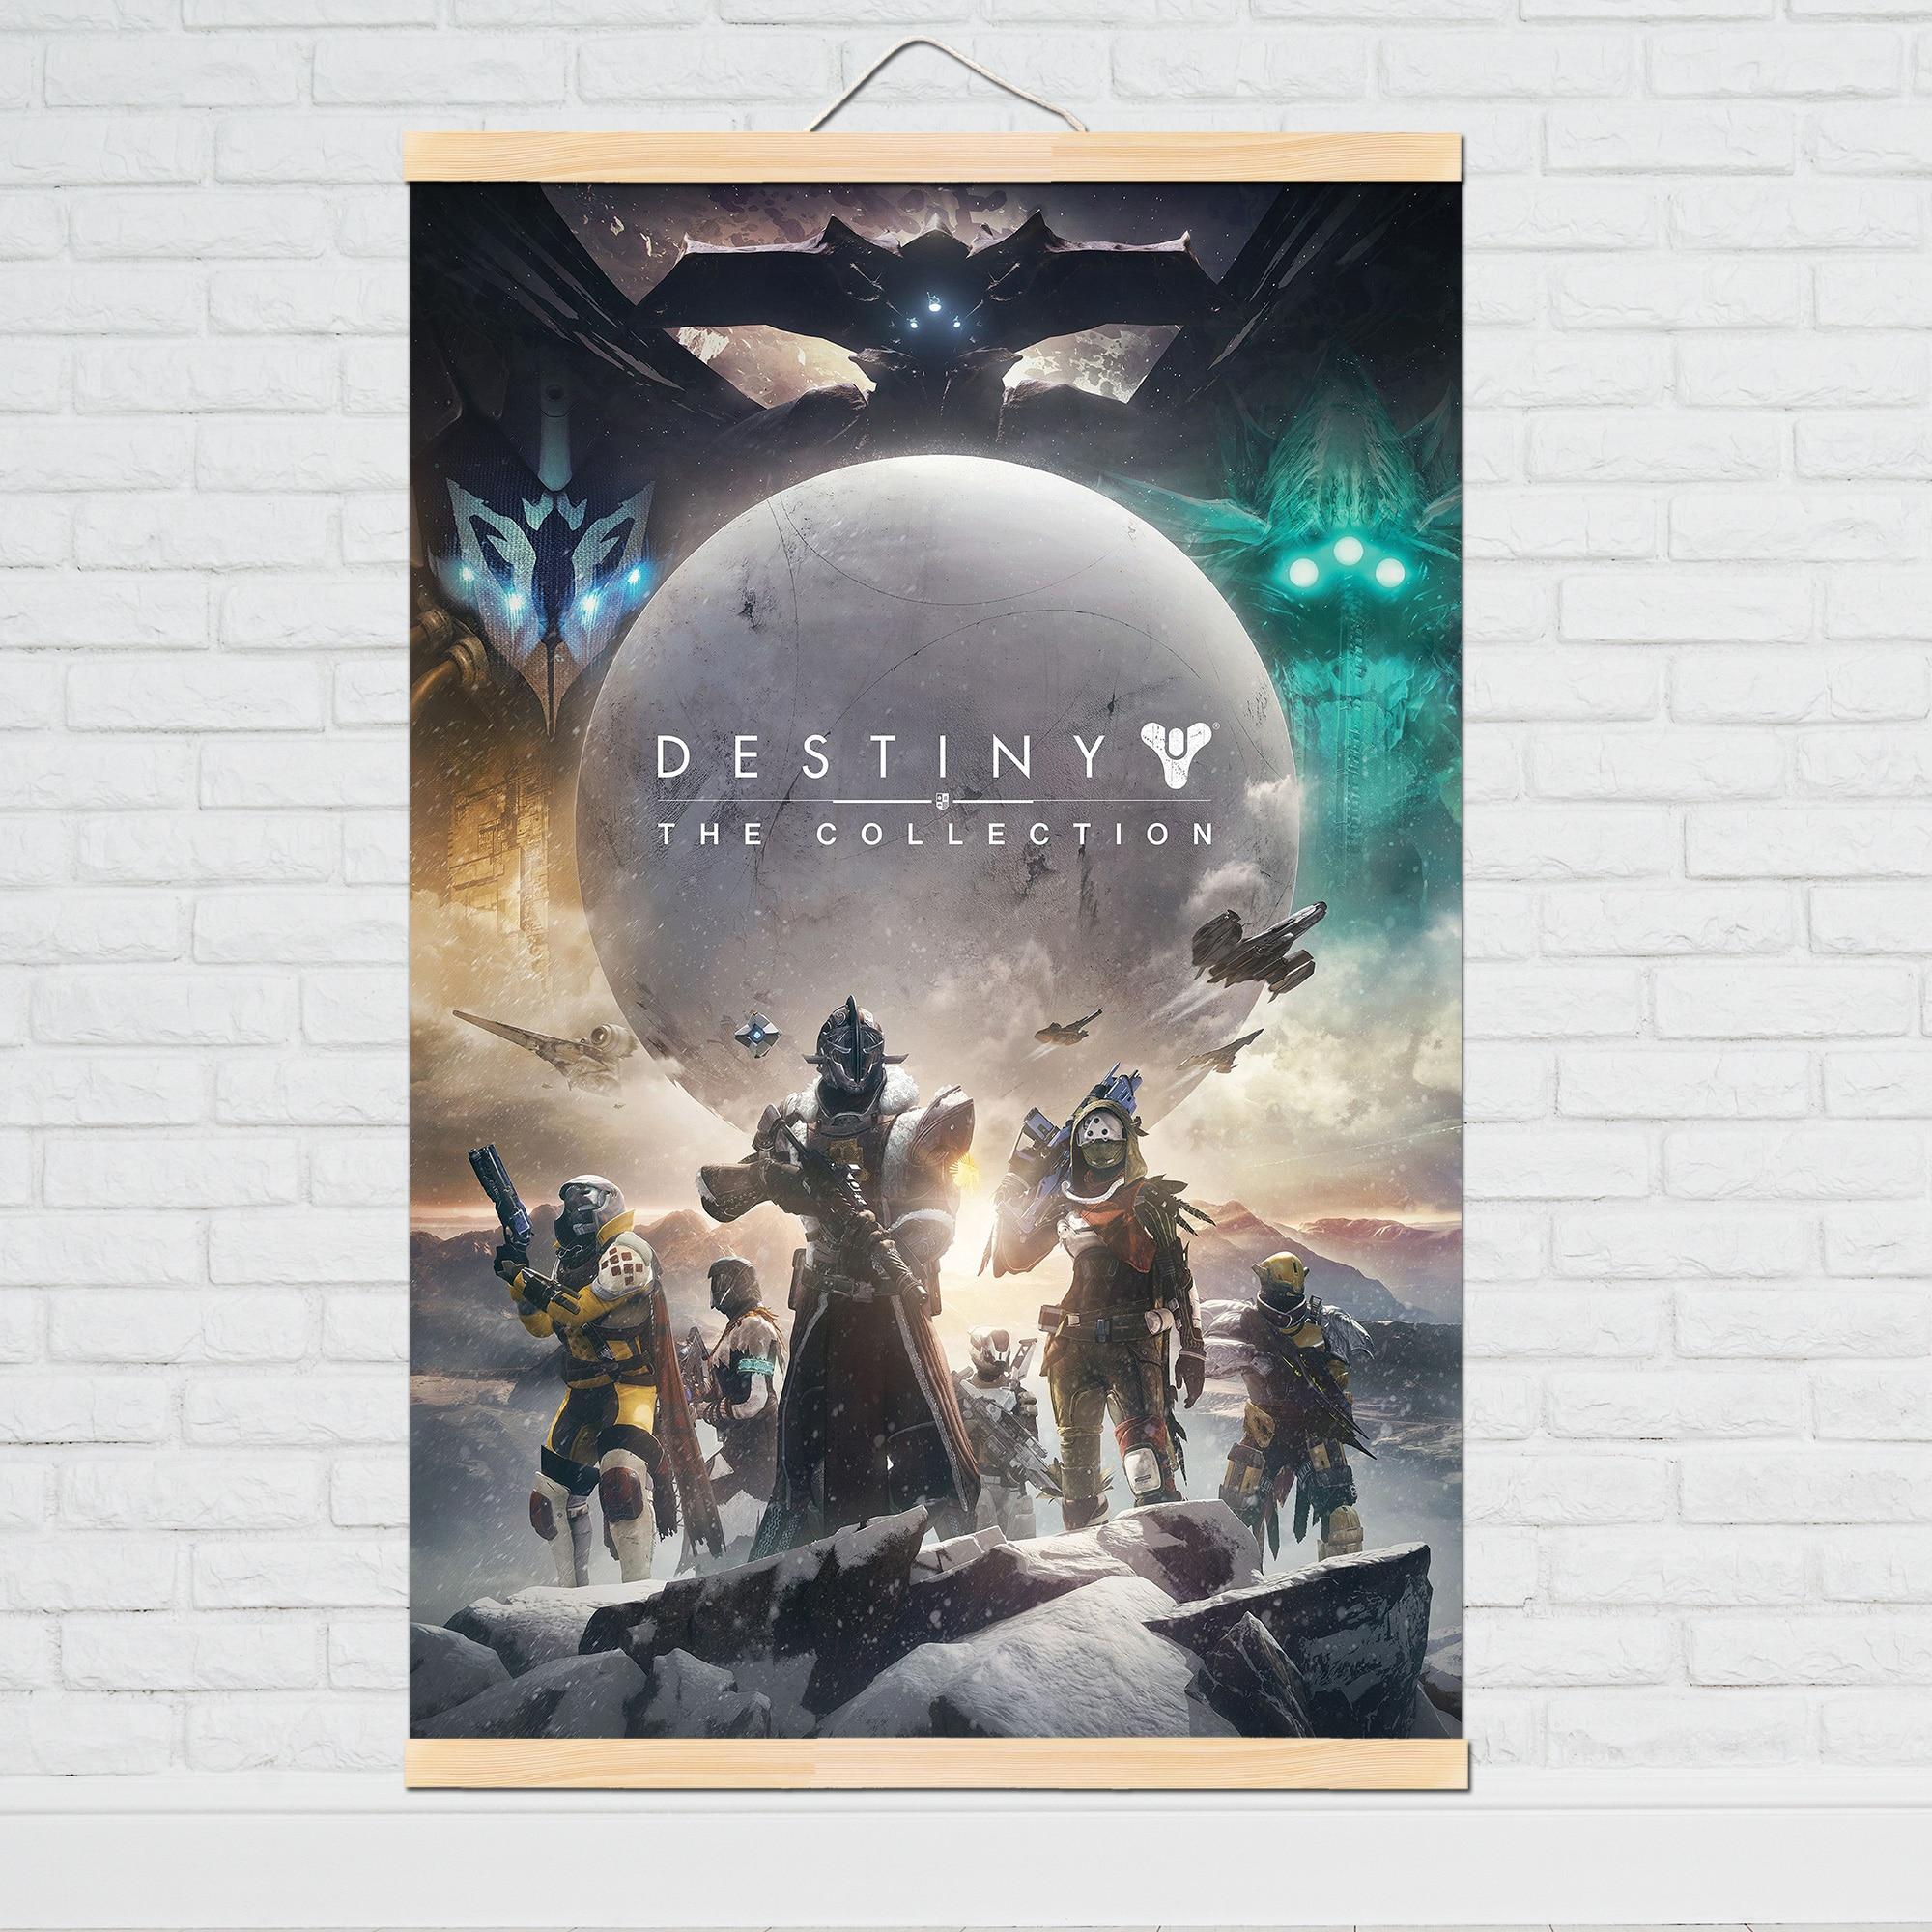 kunst the taken king destiny 2 new video game silk poster 13x24 24x43inch antiquitaten kunst nouvelan net